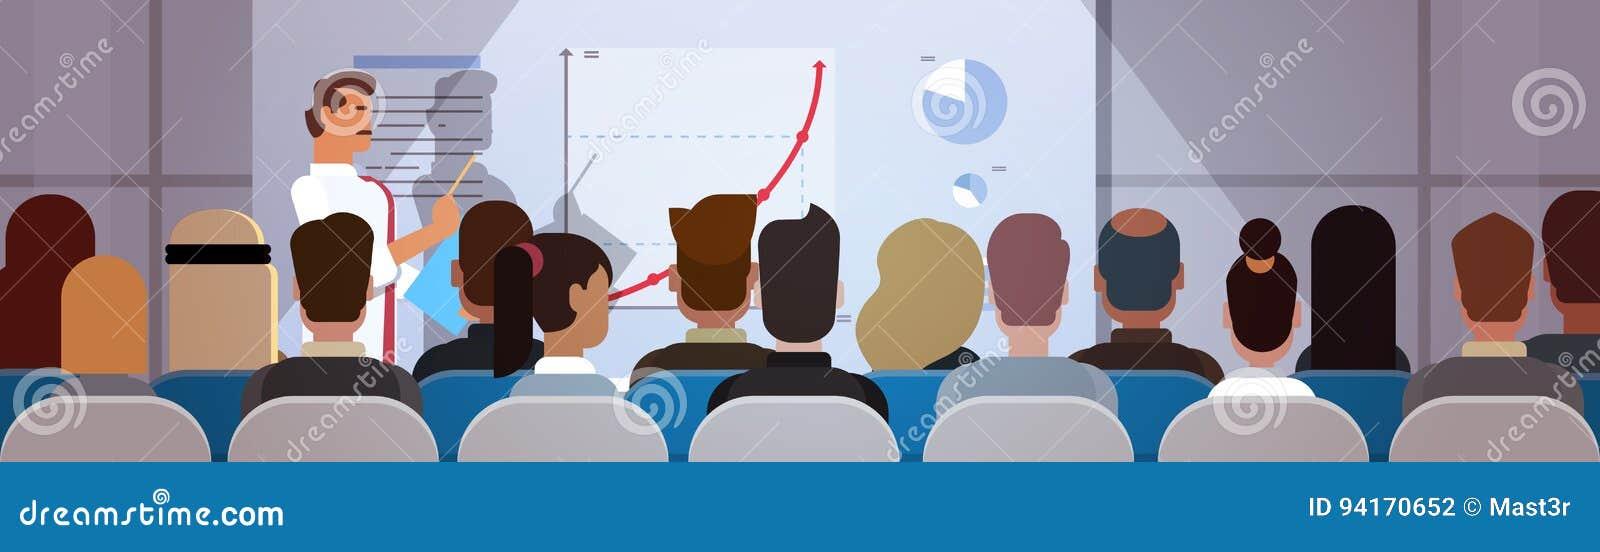 Geschäftsleute gruppieren an den Konferenz-Sitzungs-Ausbildungskursen Flip Chart mit Diagramm